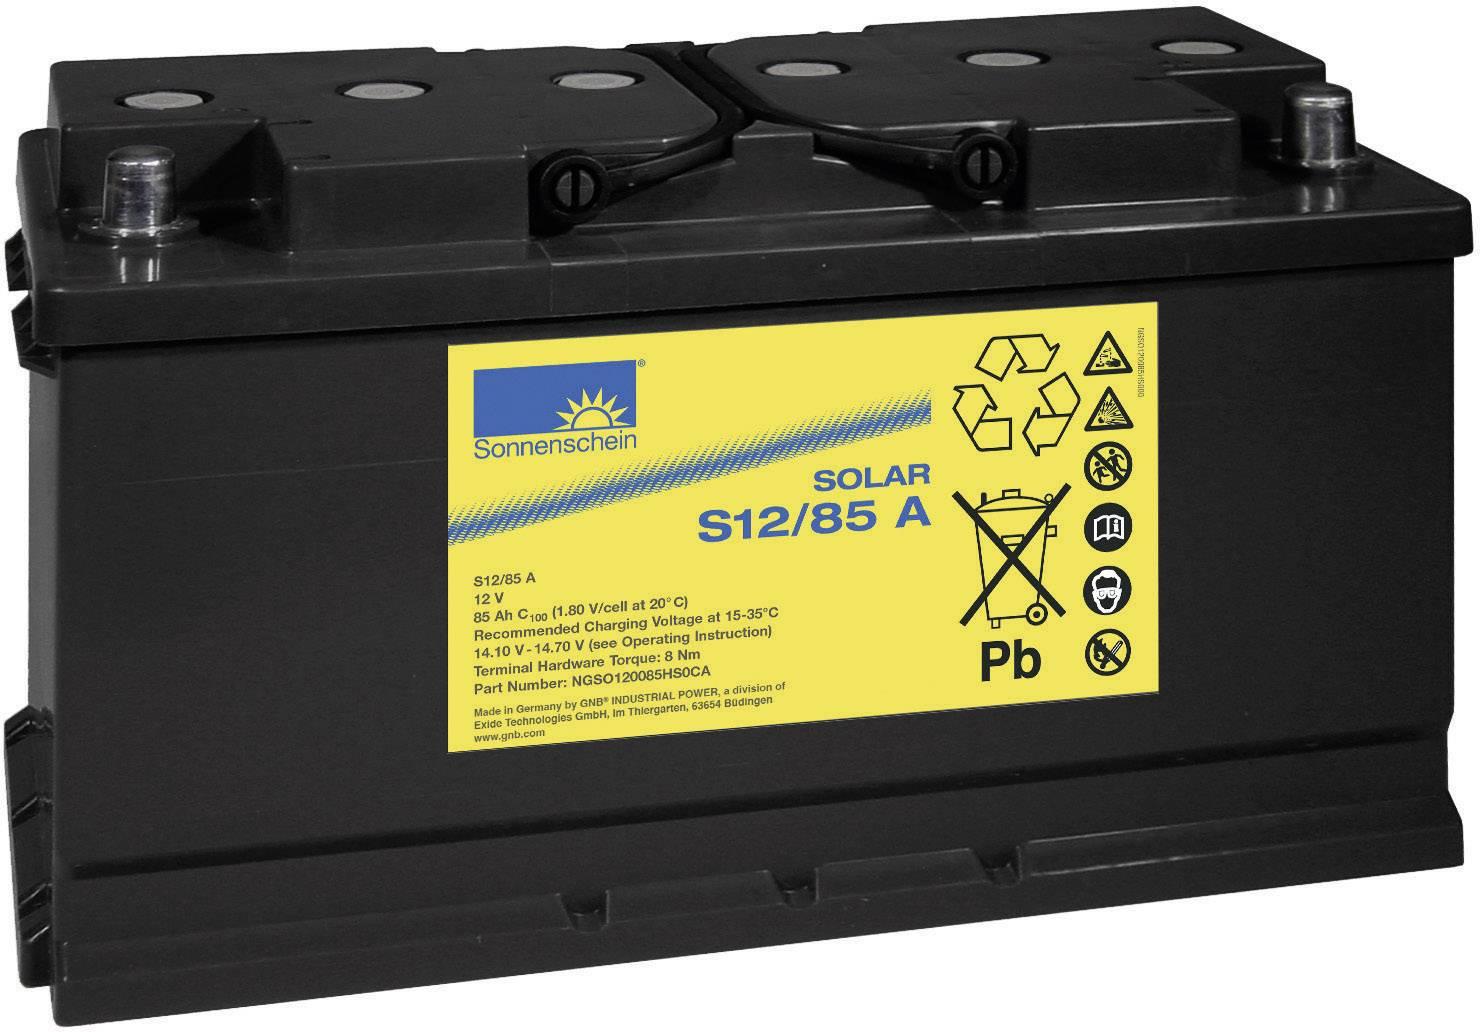 Solární akumulátor 12 V 85 Ah GNB Sonnenschein S12/85 A S 12/85 A